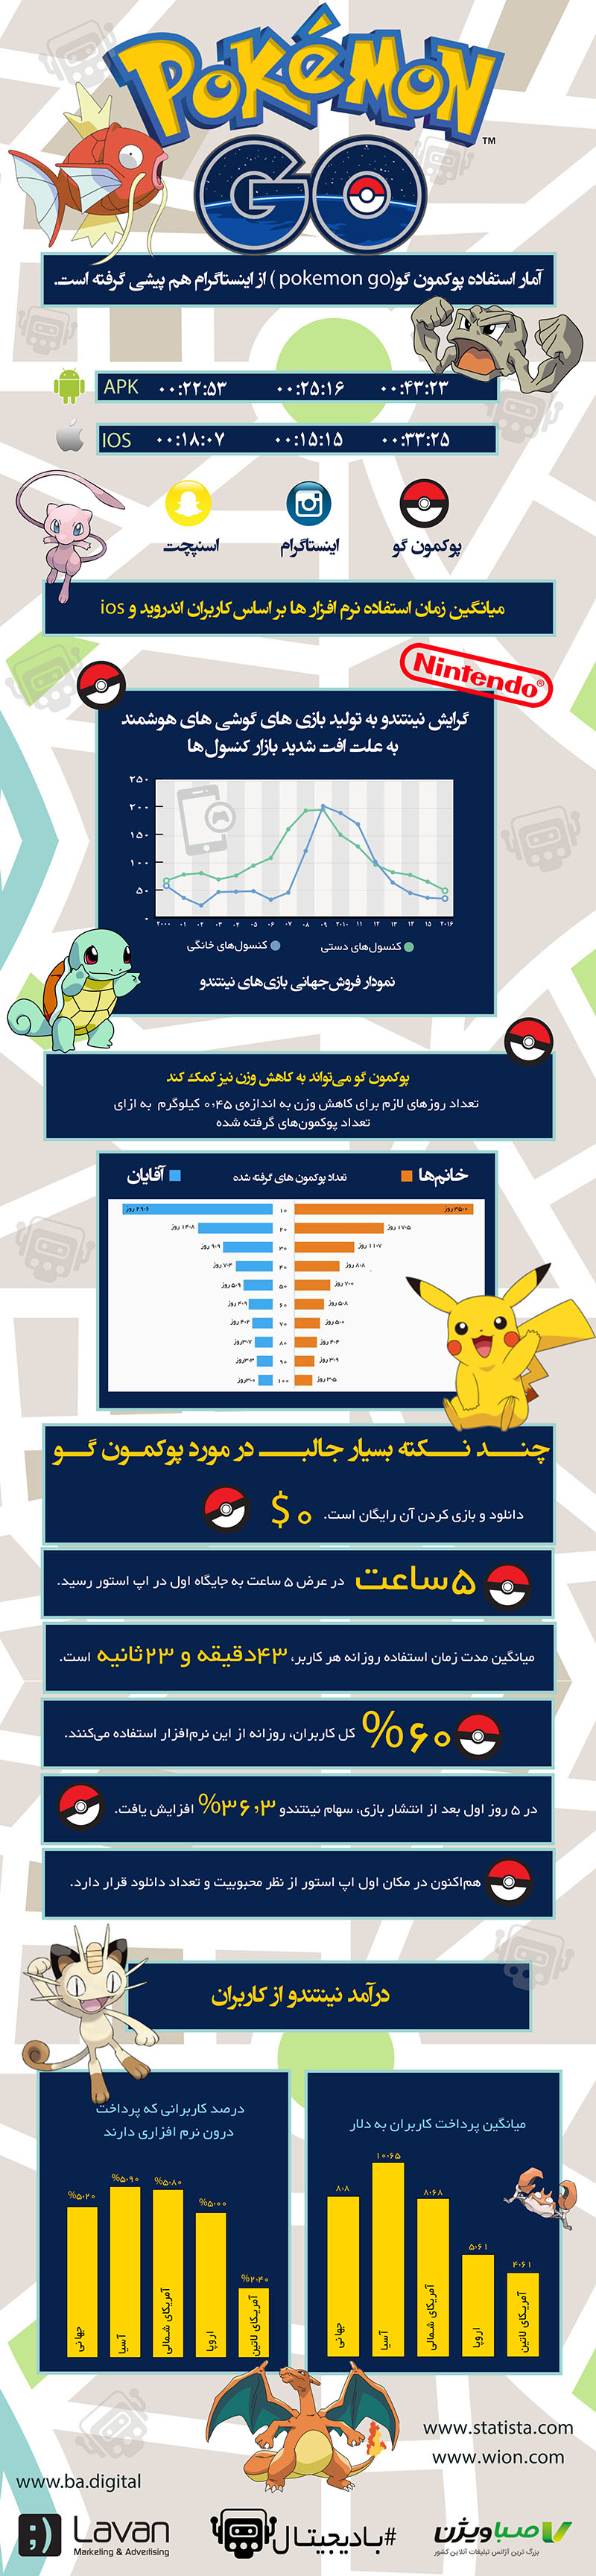 اینفوگرافیک پوکمون گو pokemon-go